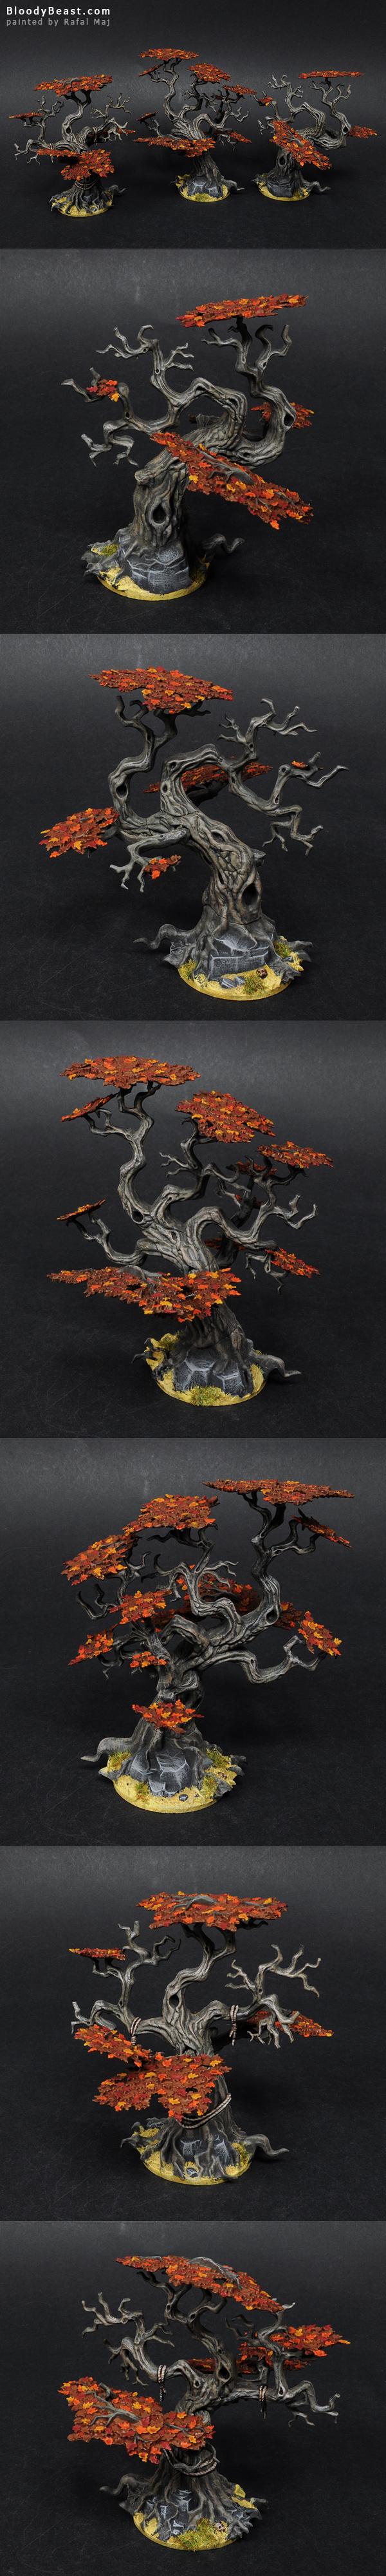 Citadel Wood Trees painted by Rafal Maj (BloodyBeast.com)